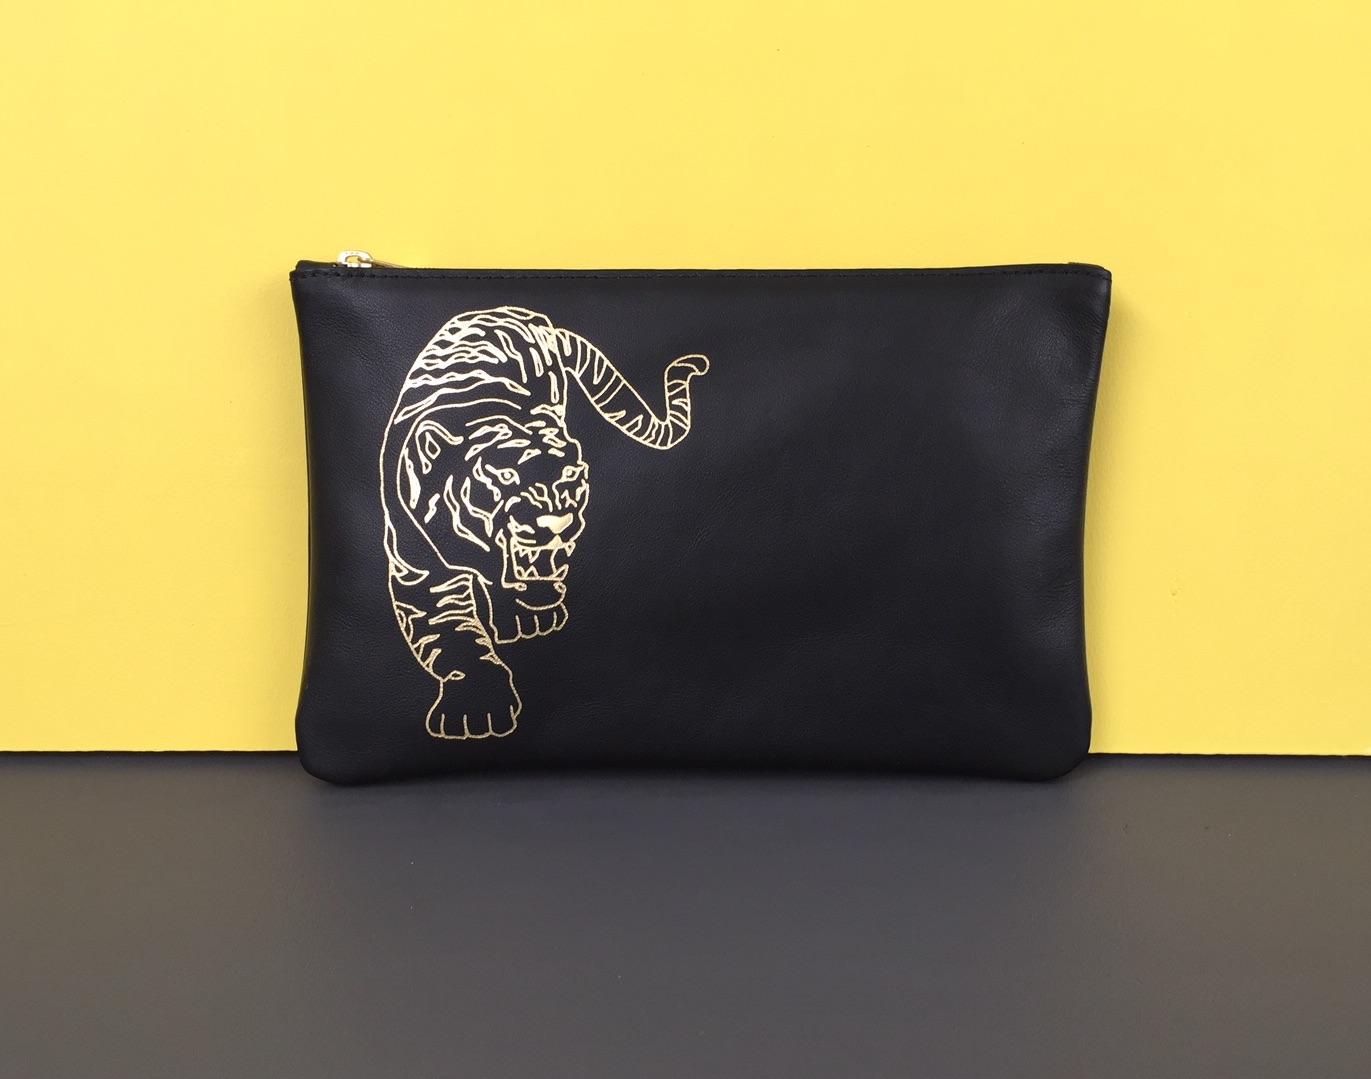 LT002-BK - etui tiger black